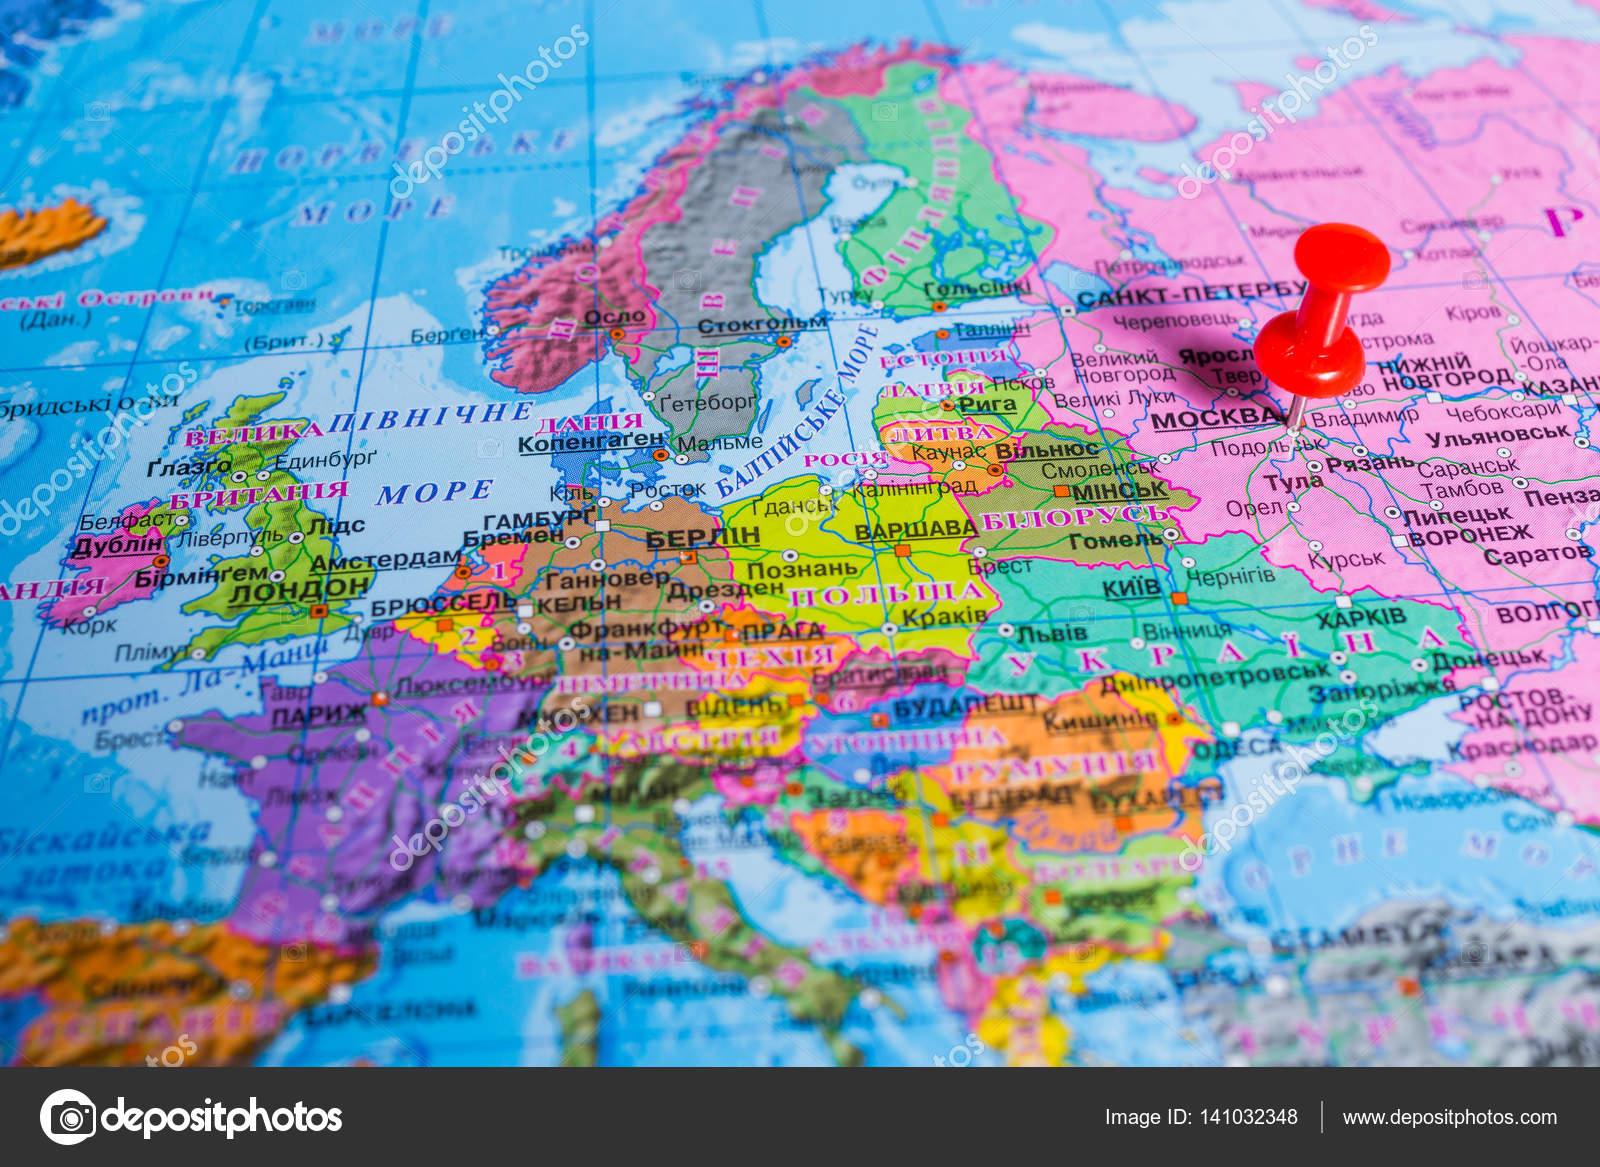 Vinnitsa Ukrajina 6 Prosince 2016 Mapa Sveta Abstraktni Ba